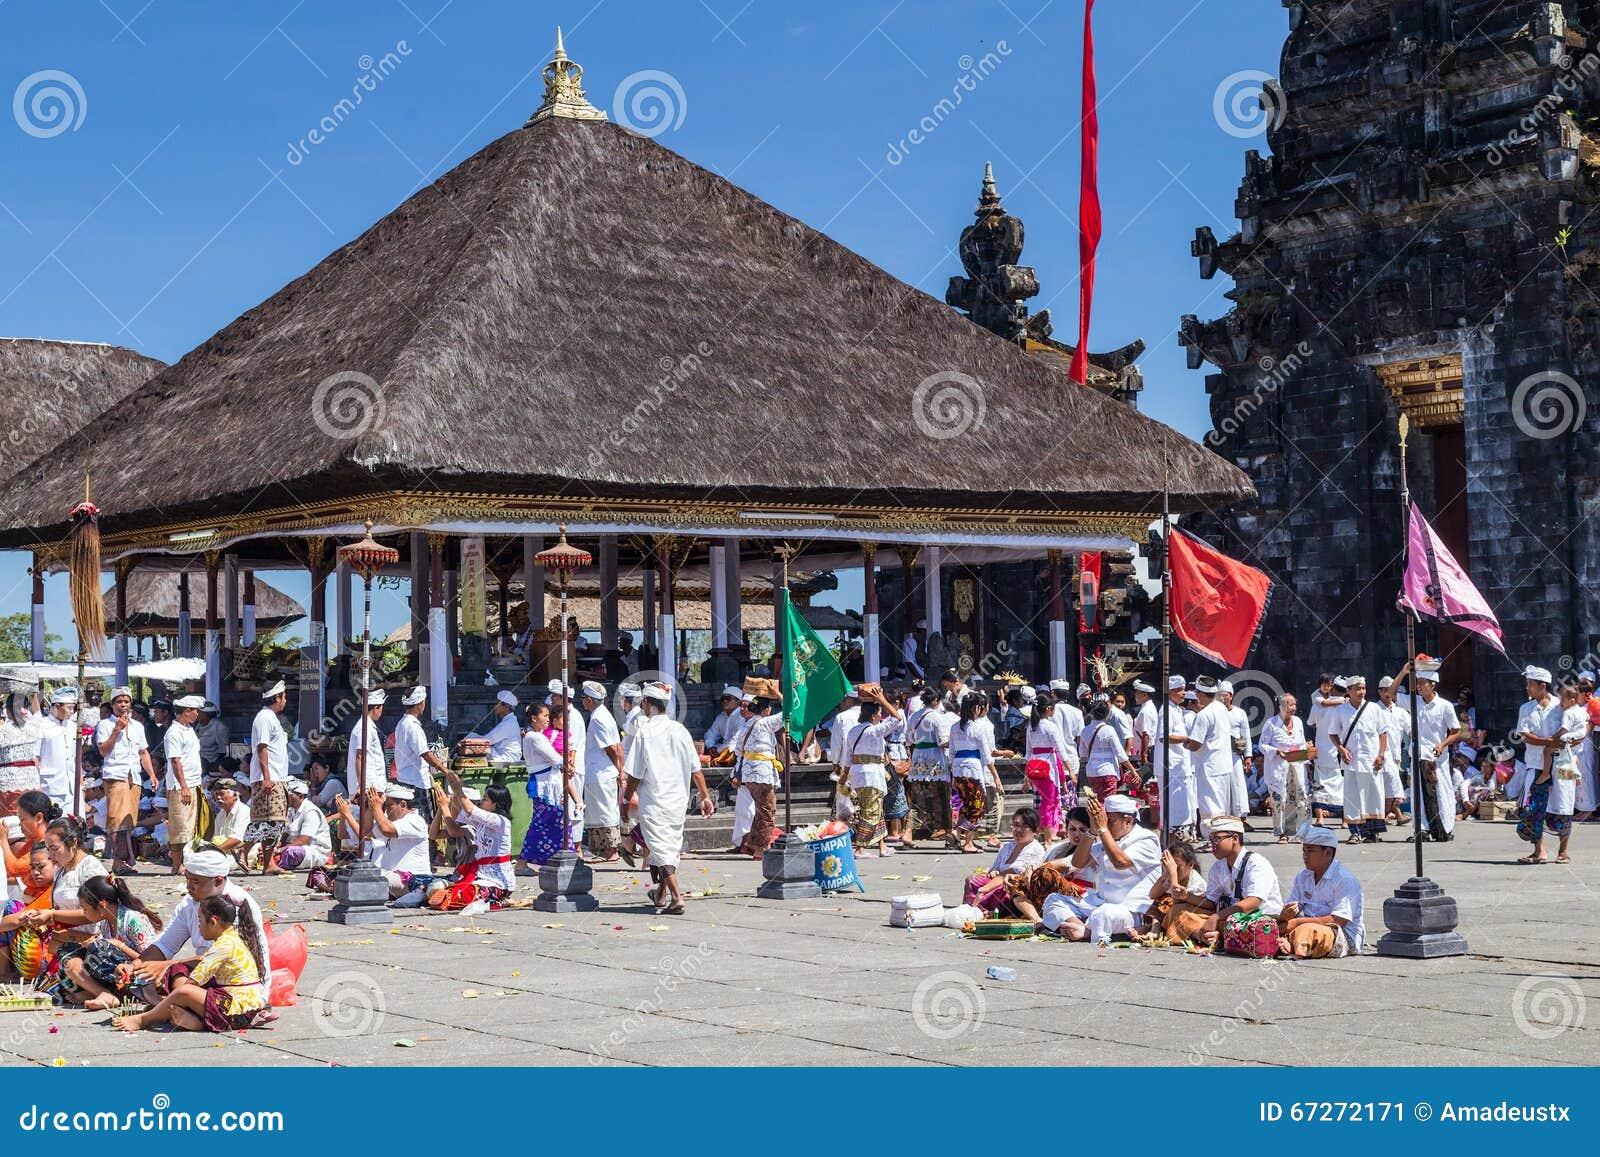 Village of Besakih, Bali/Indonesia - circa October 2015: People praying in Pura Besakih Balinese temple